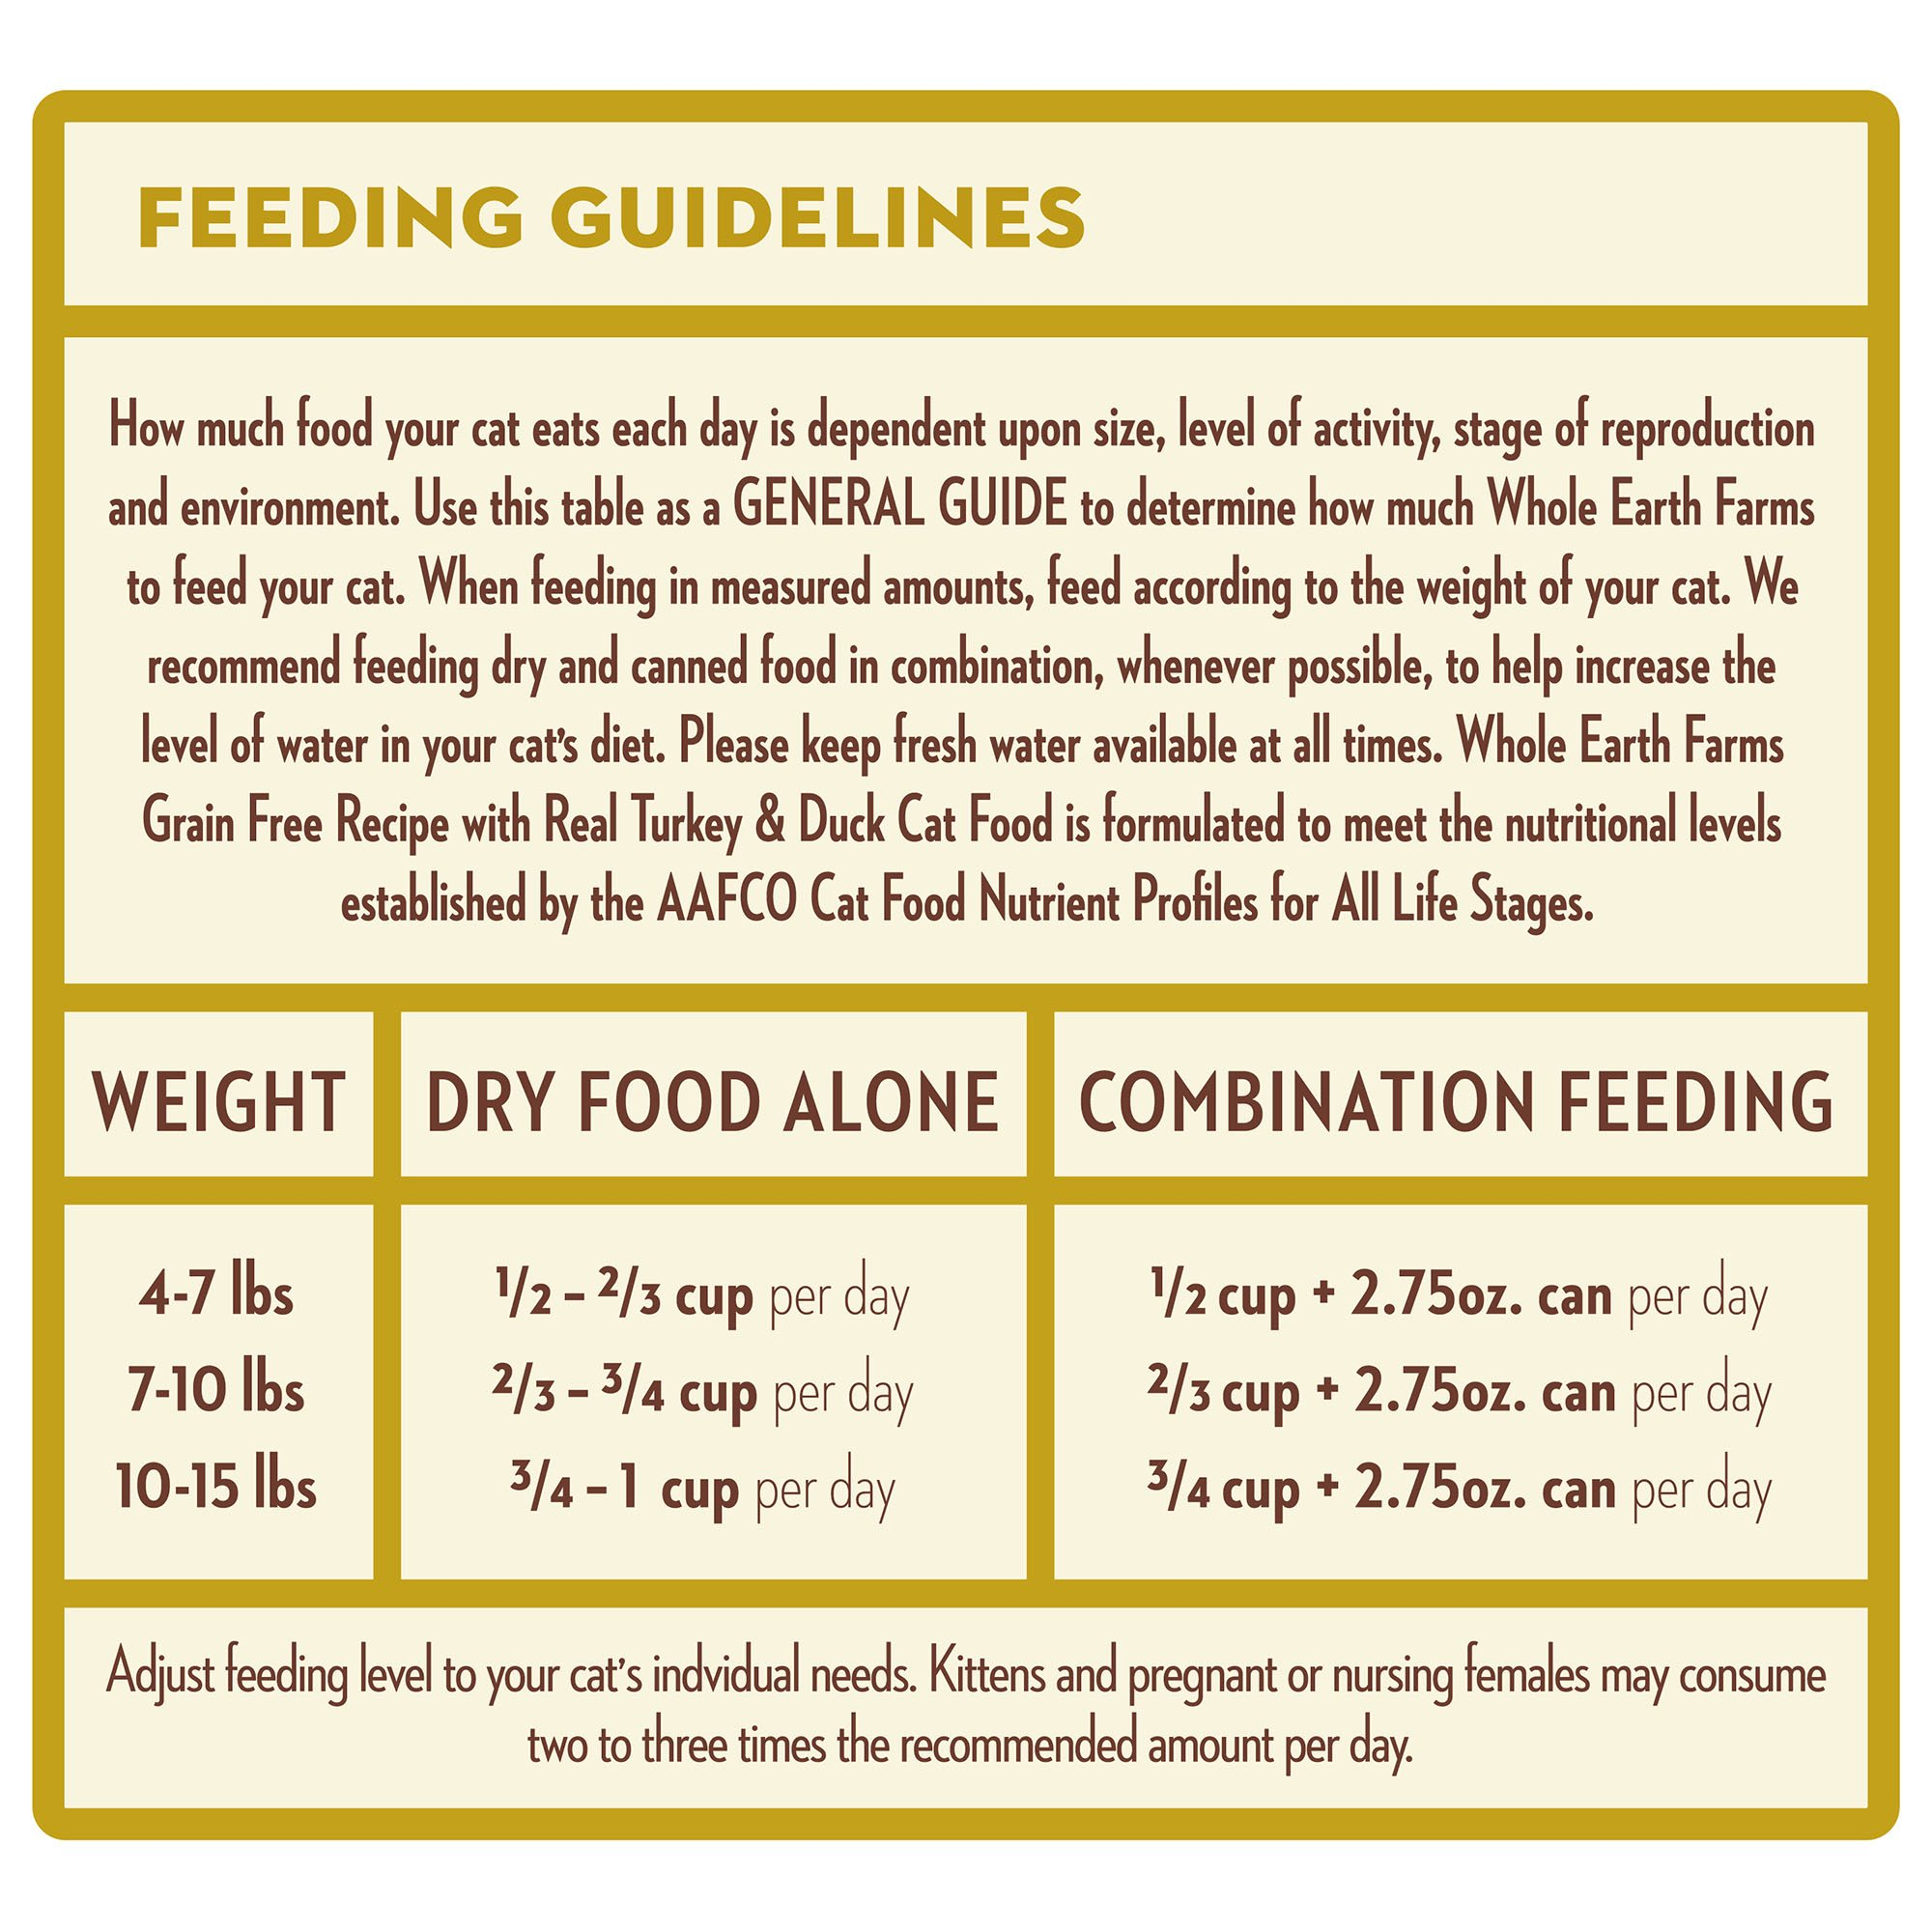 Whole-Earth-Farms-Grain-Free-Real-Turkey-amp-Duck-Cat-Food thumbnail 19